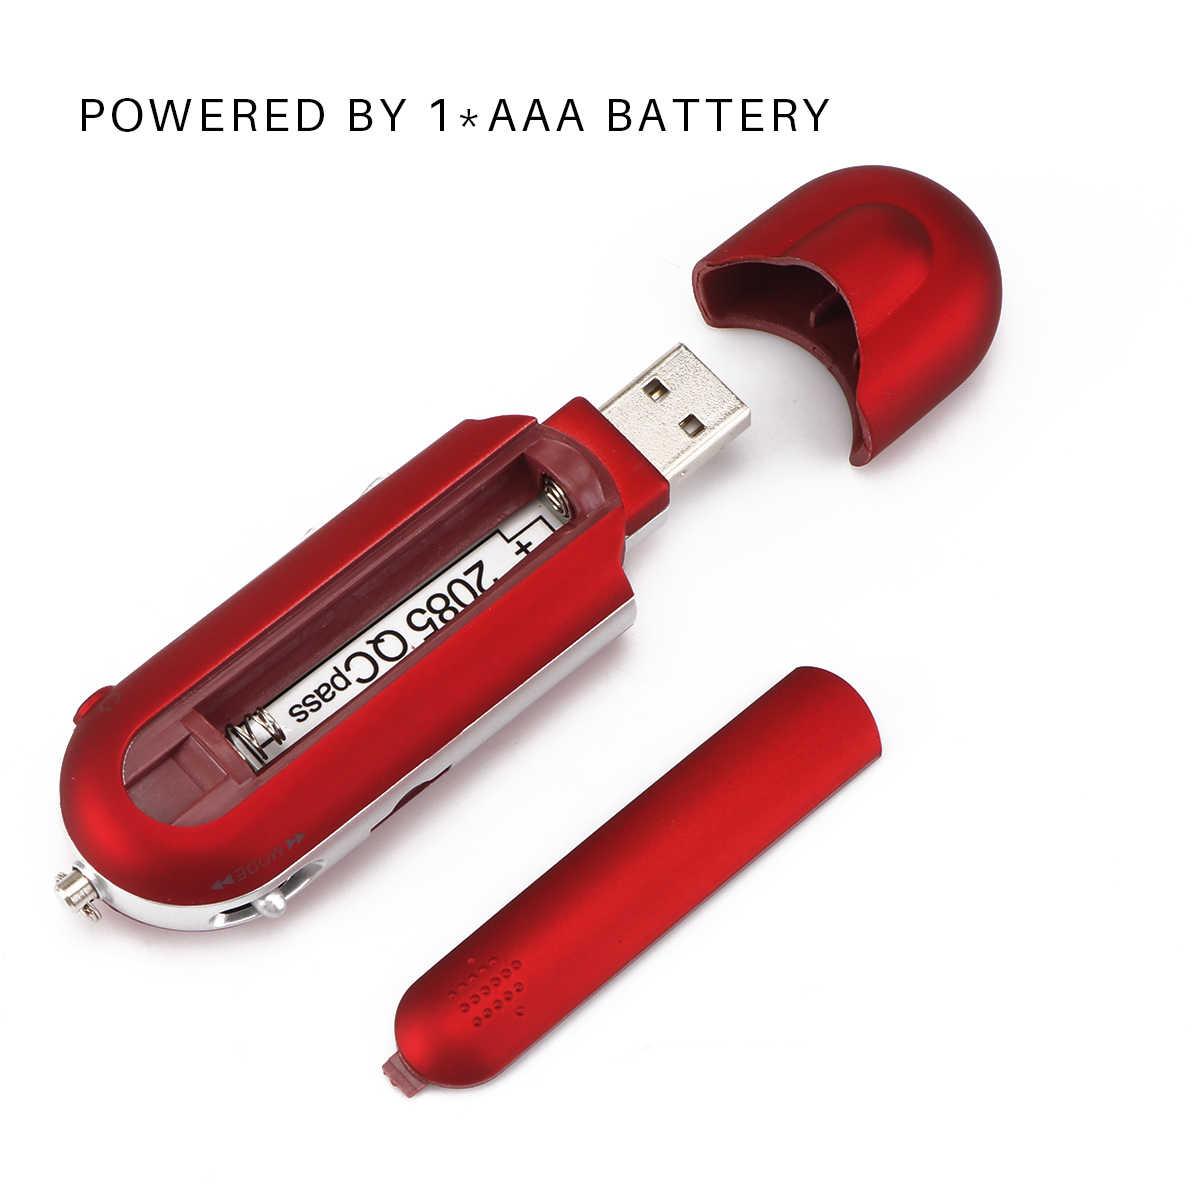 Mini USB แบบพกพา MP3 เครื่องเล่นวิทยุ FM ได้ยินเพลงที่สง่างาม MP3 สนับสนุน 32GB TF Card SD Card และวิทยุ FM